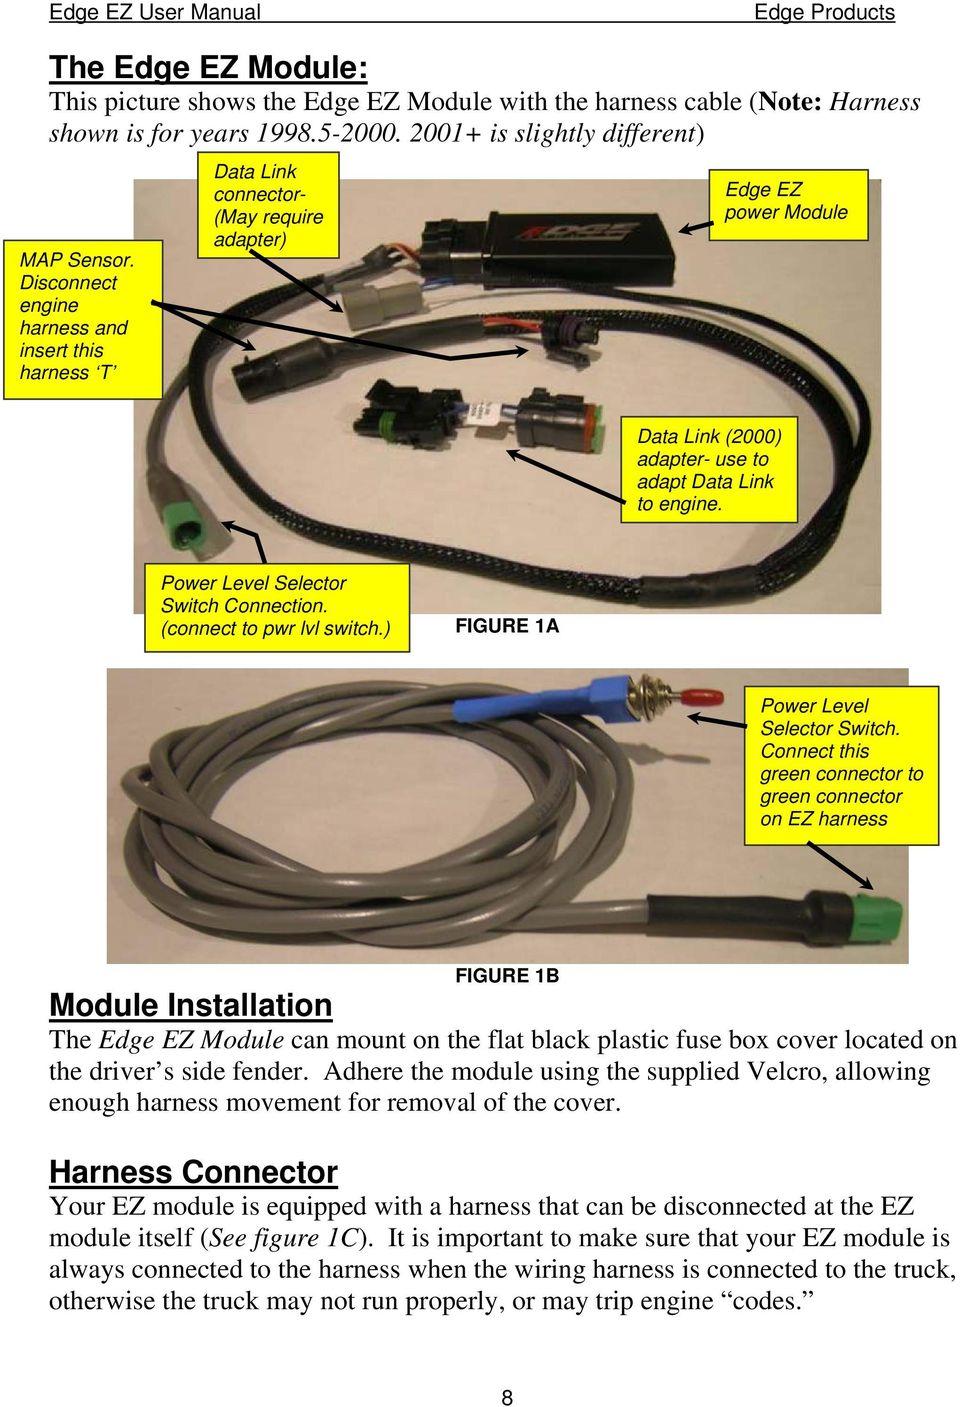 hight resolution of dodge cummins 5 9l 24 valve edge products ez module installation 1995 ez go wiring diagram edge ez wiring diagram